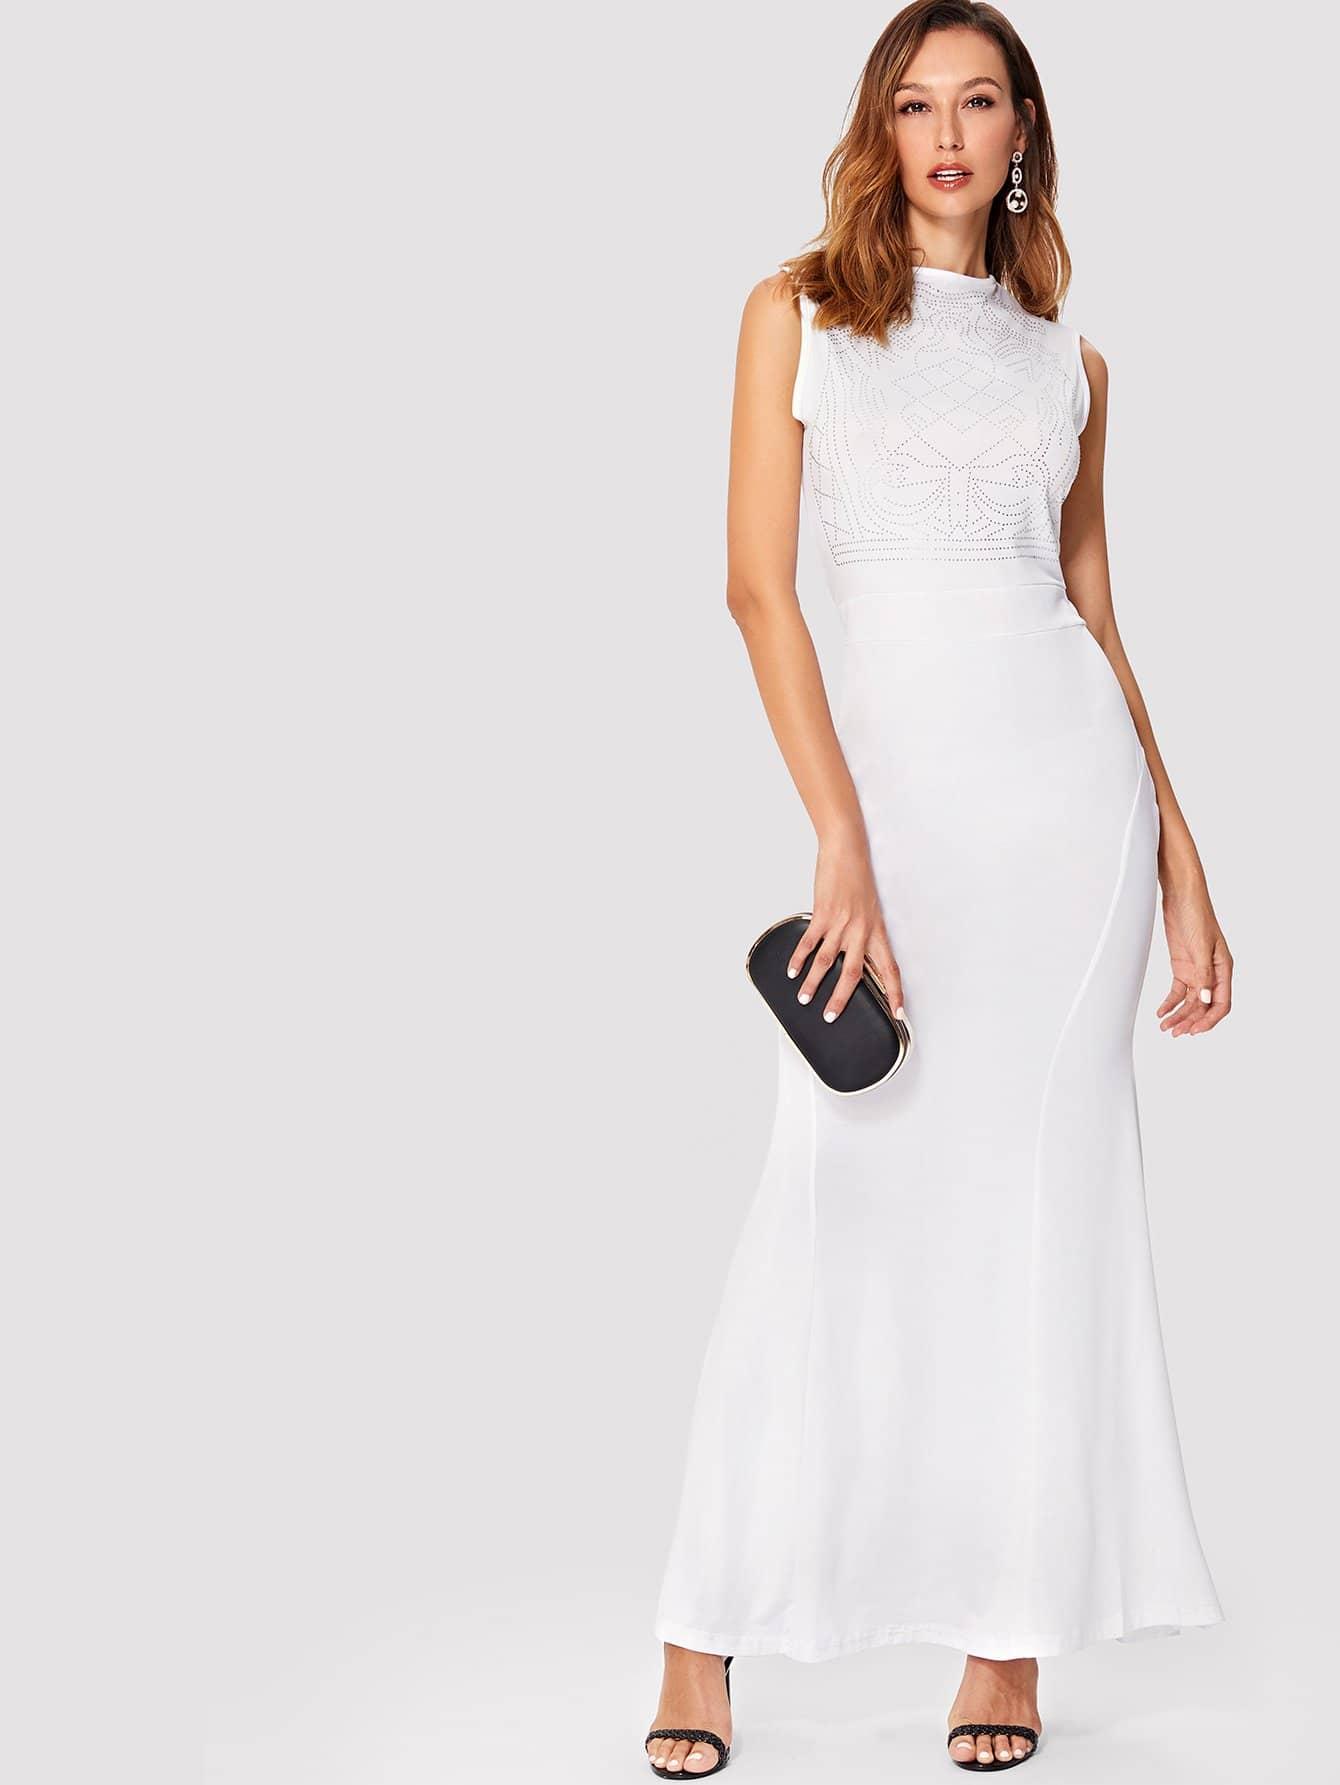 Diamond Tailored Mock Neck Long Dress diamond tailored mock neck long dress